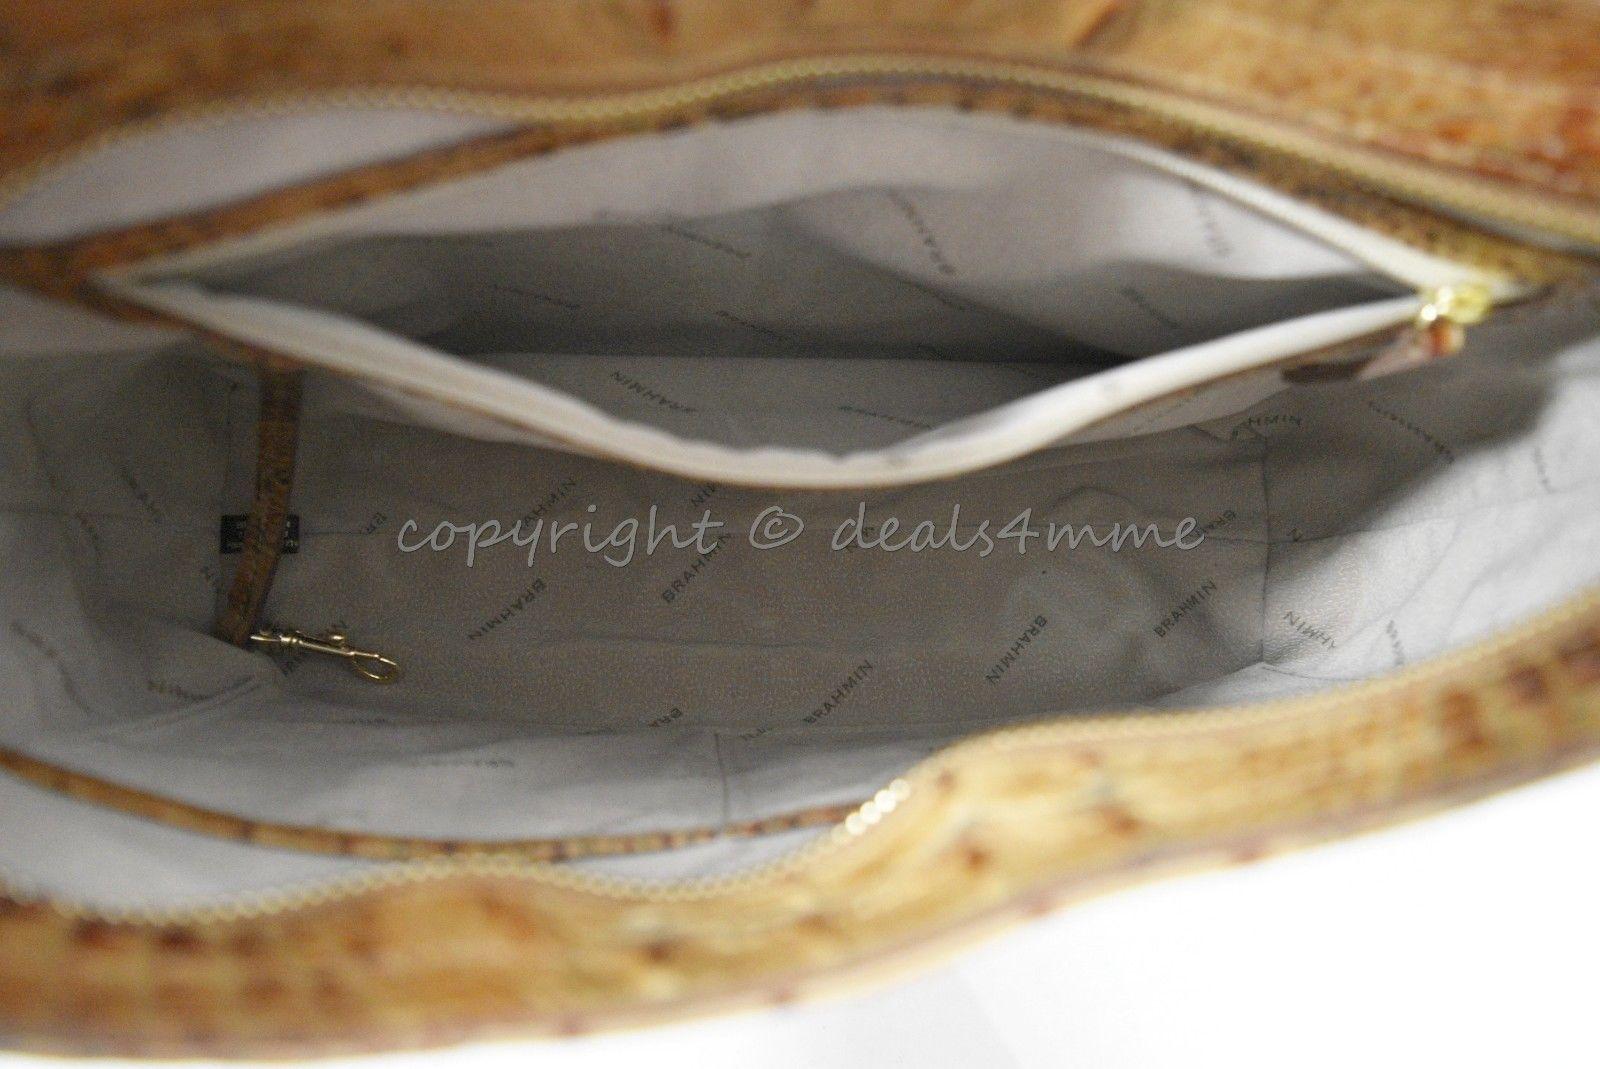 NWT Brahmin Noelle Leather Tote / Shoulder Bag in Toasted Almond Melbourne image 7